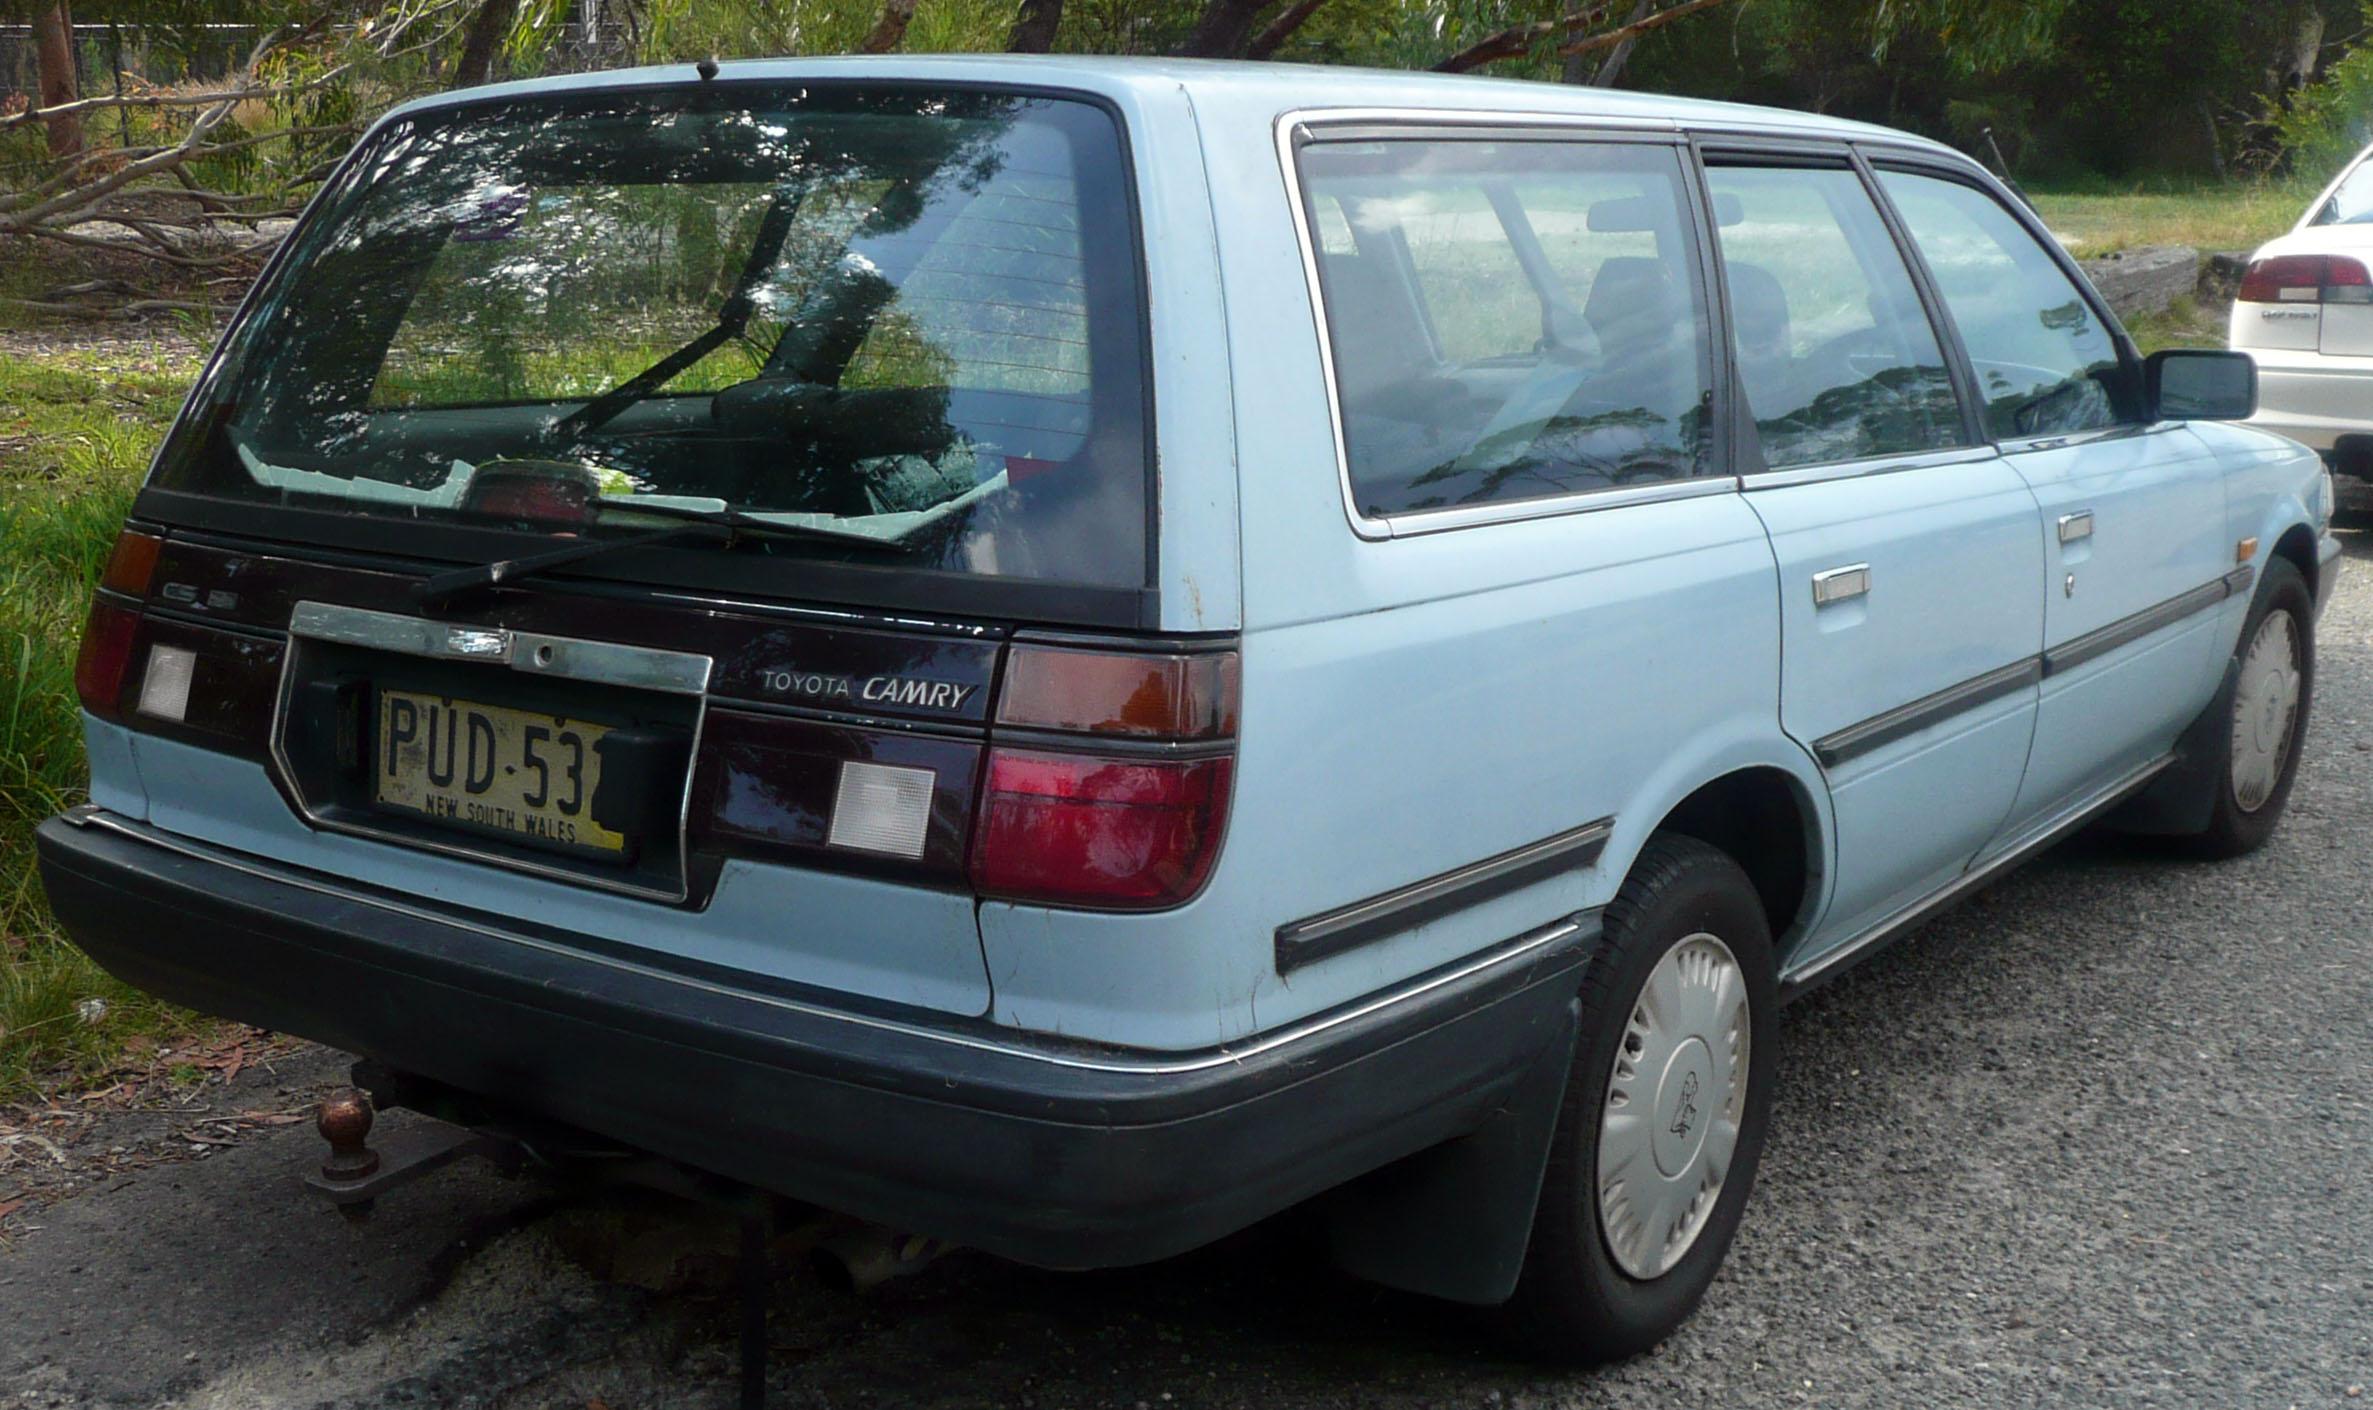 1990 Ford Taurus >> File:1989-1990 Toyota Camry (SV21) CS station wagon 02.jpg ...